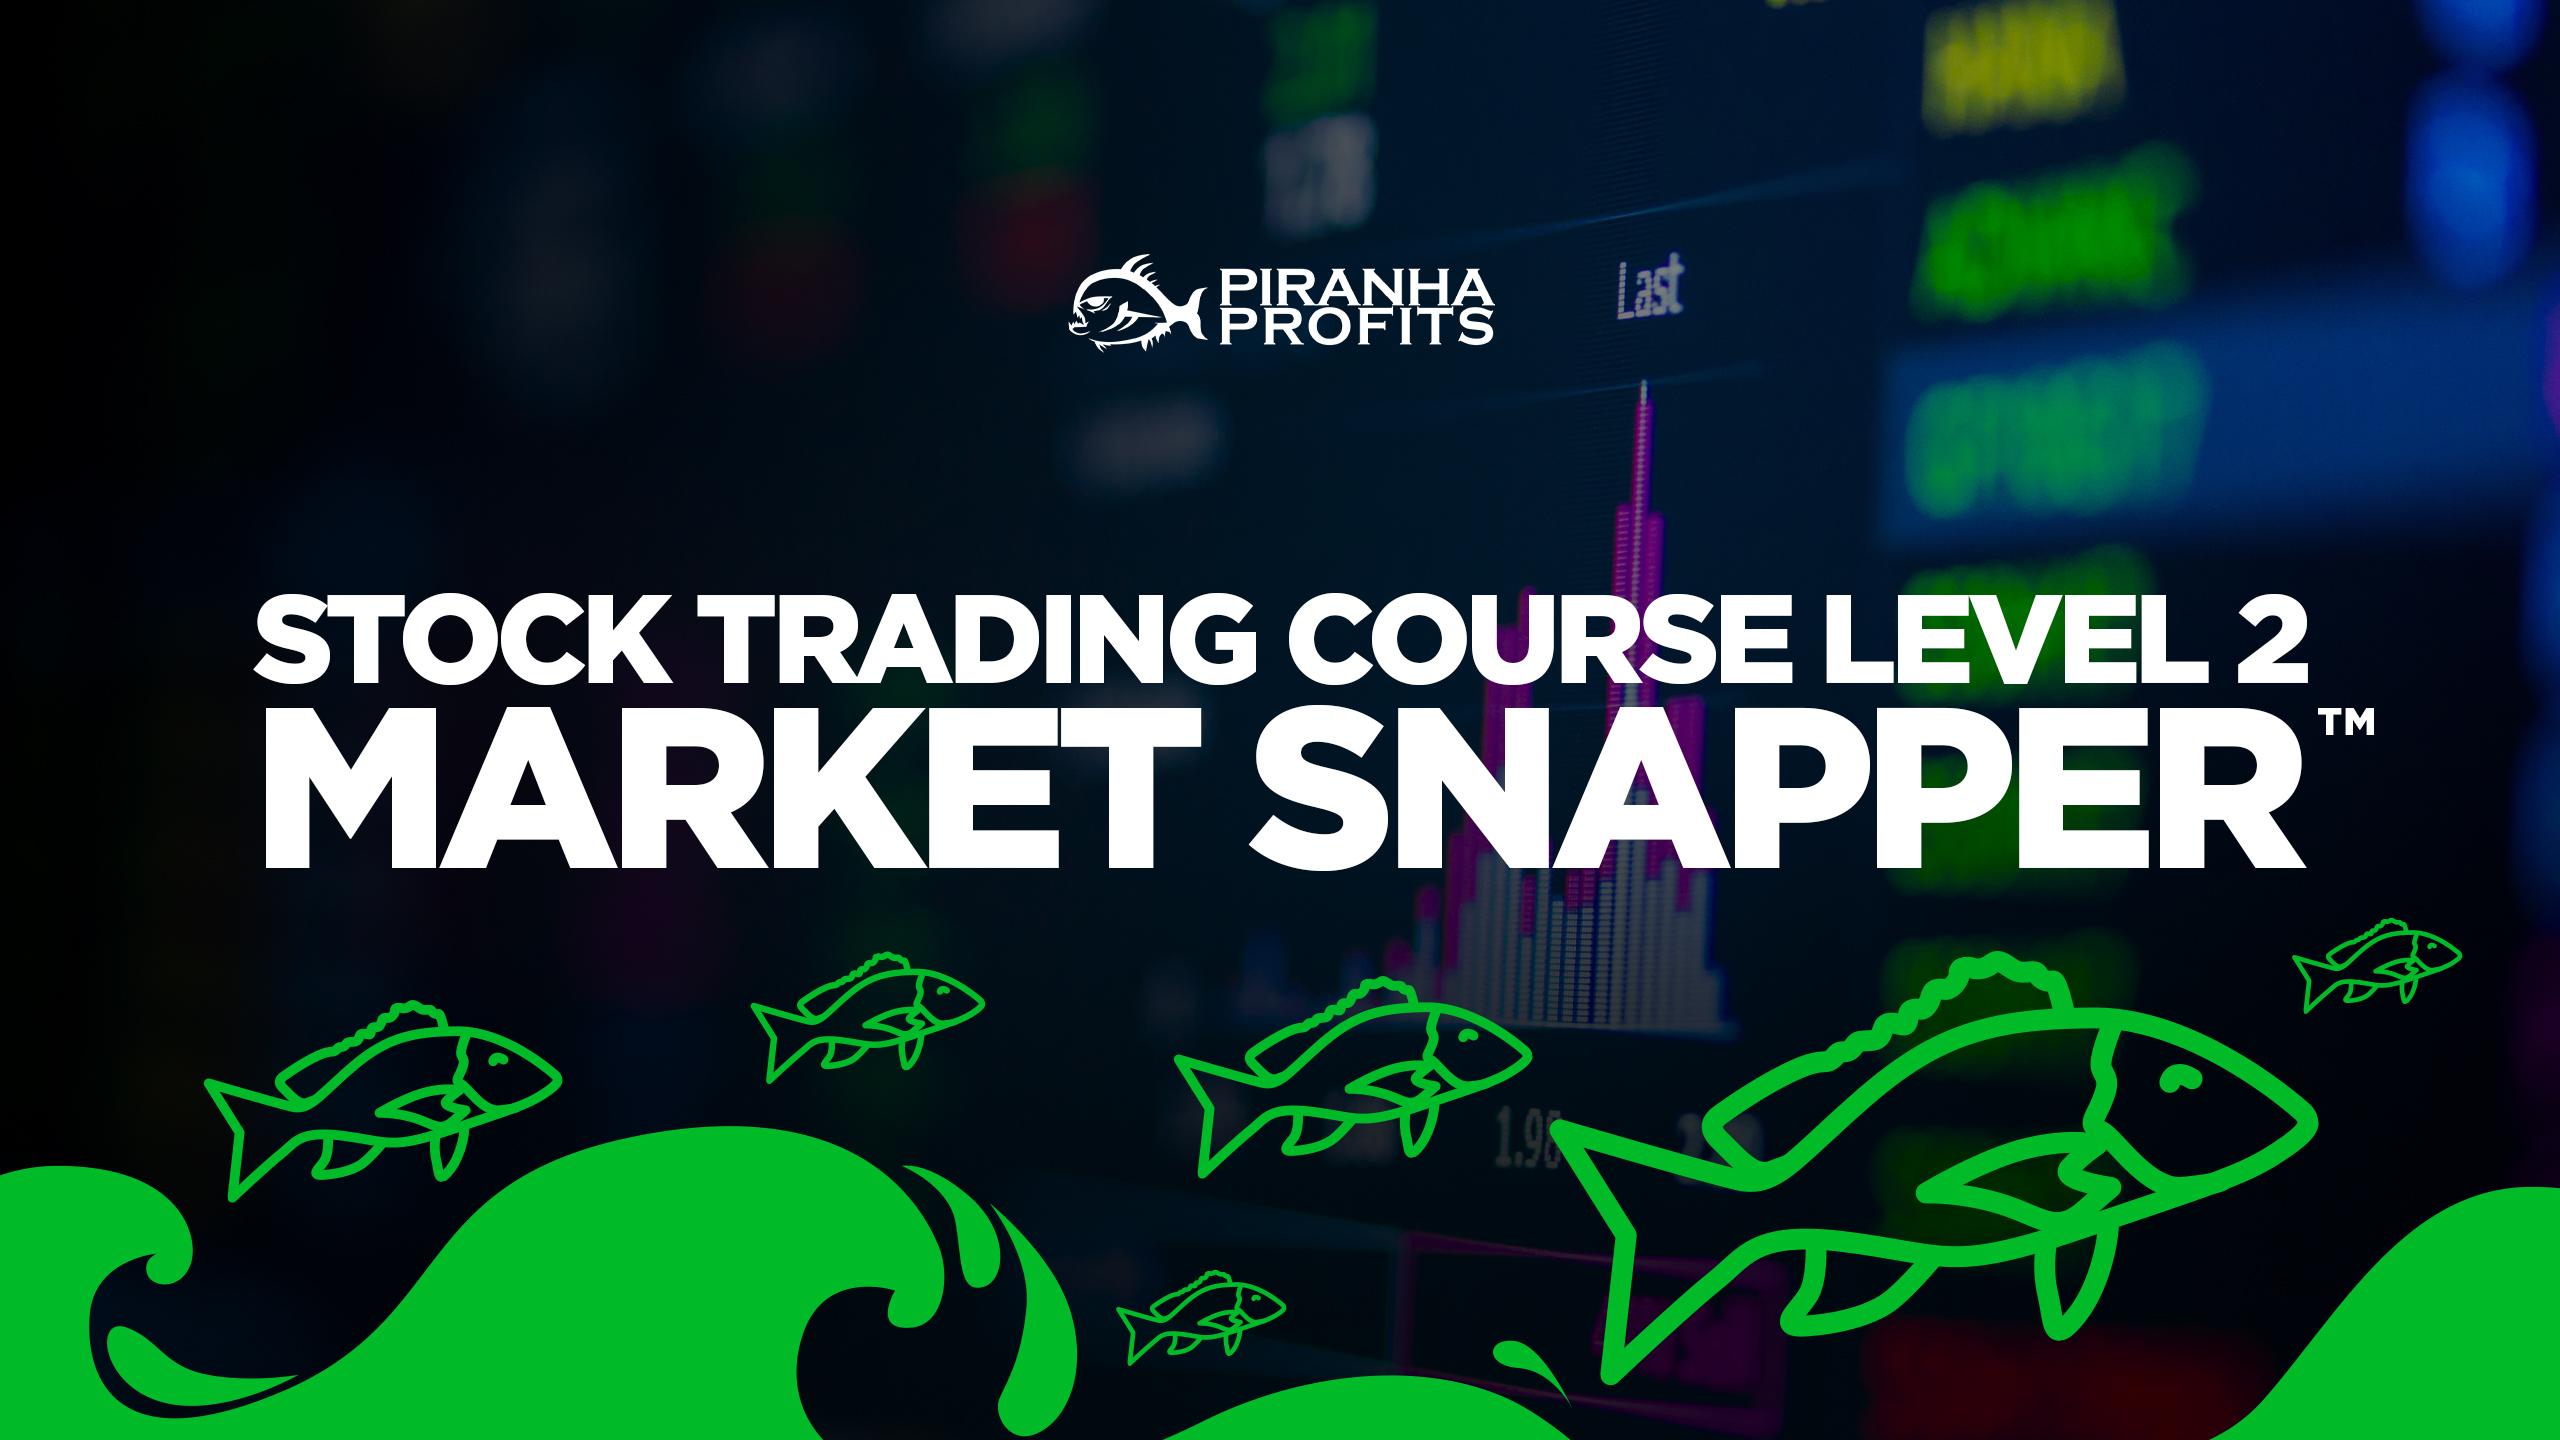 Online Stock Trading Course Level 2 Market Snapper banner